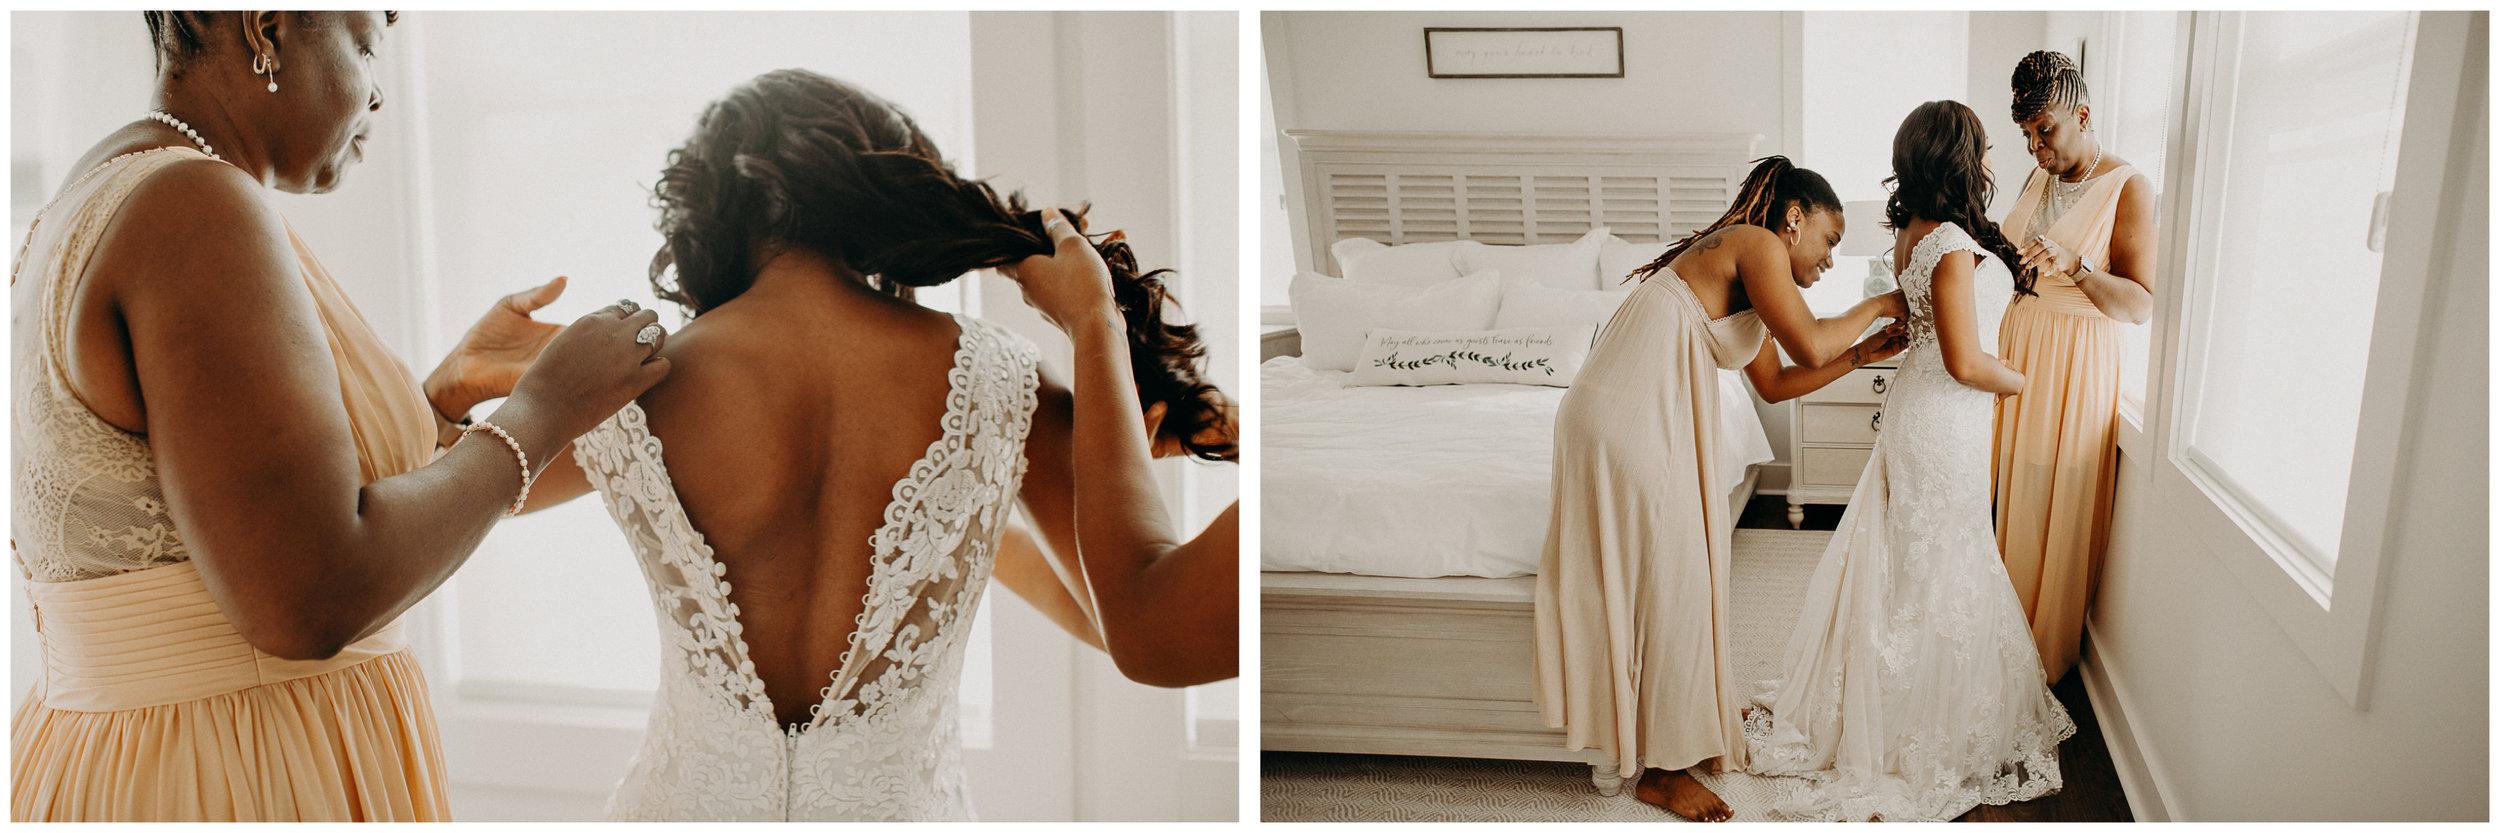 13.4 -Wedding_day_atlanta_georgia_bride_details_dress_aline_marin_photography_-11.jpg